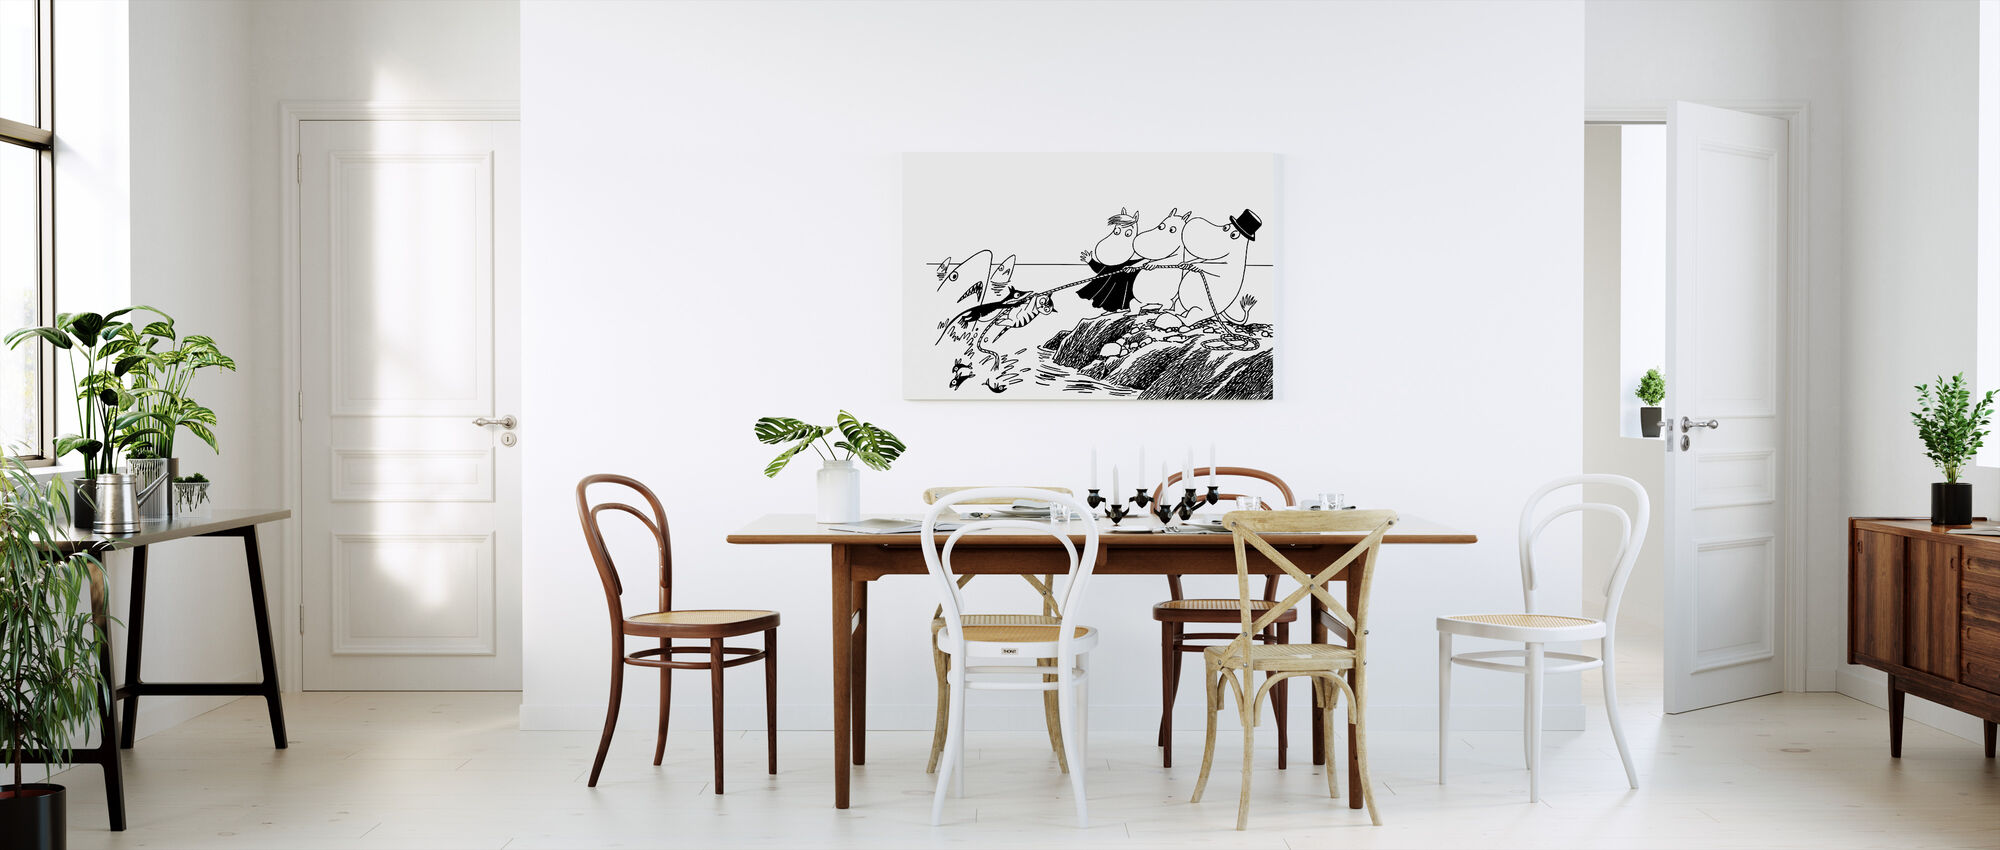 Moomins Gone Fishing - Canvas print - Kitchen